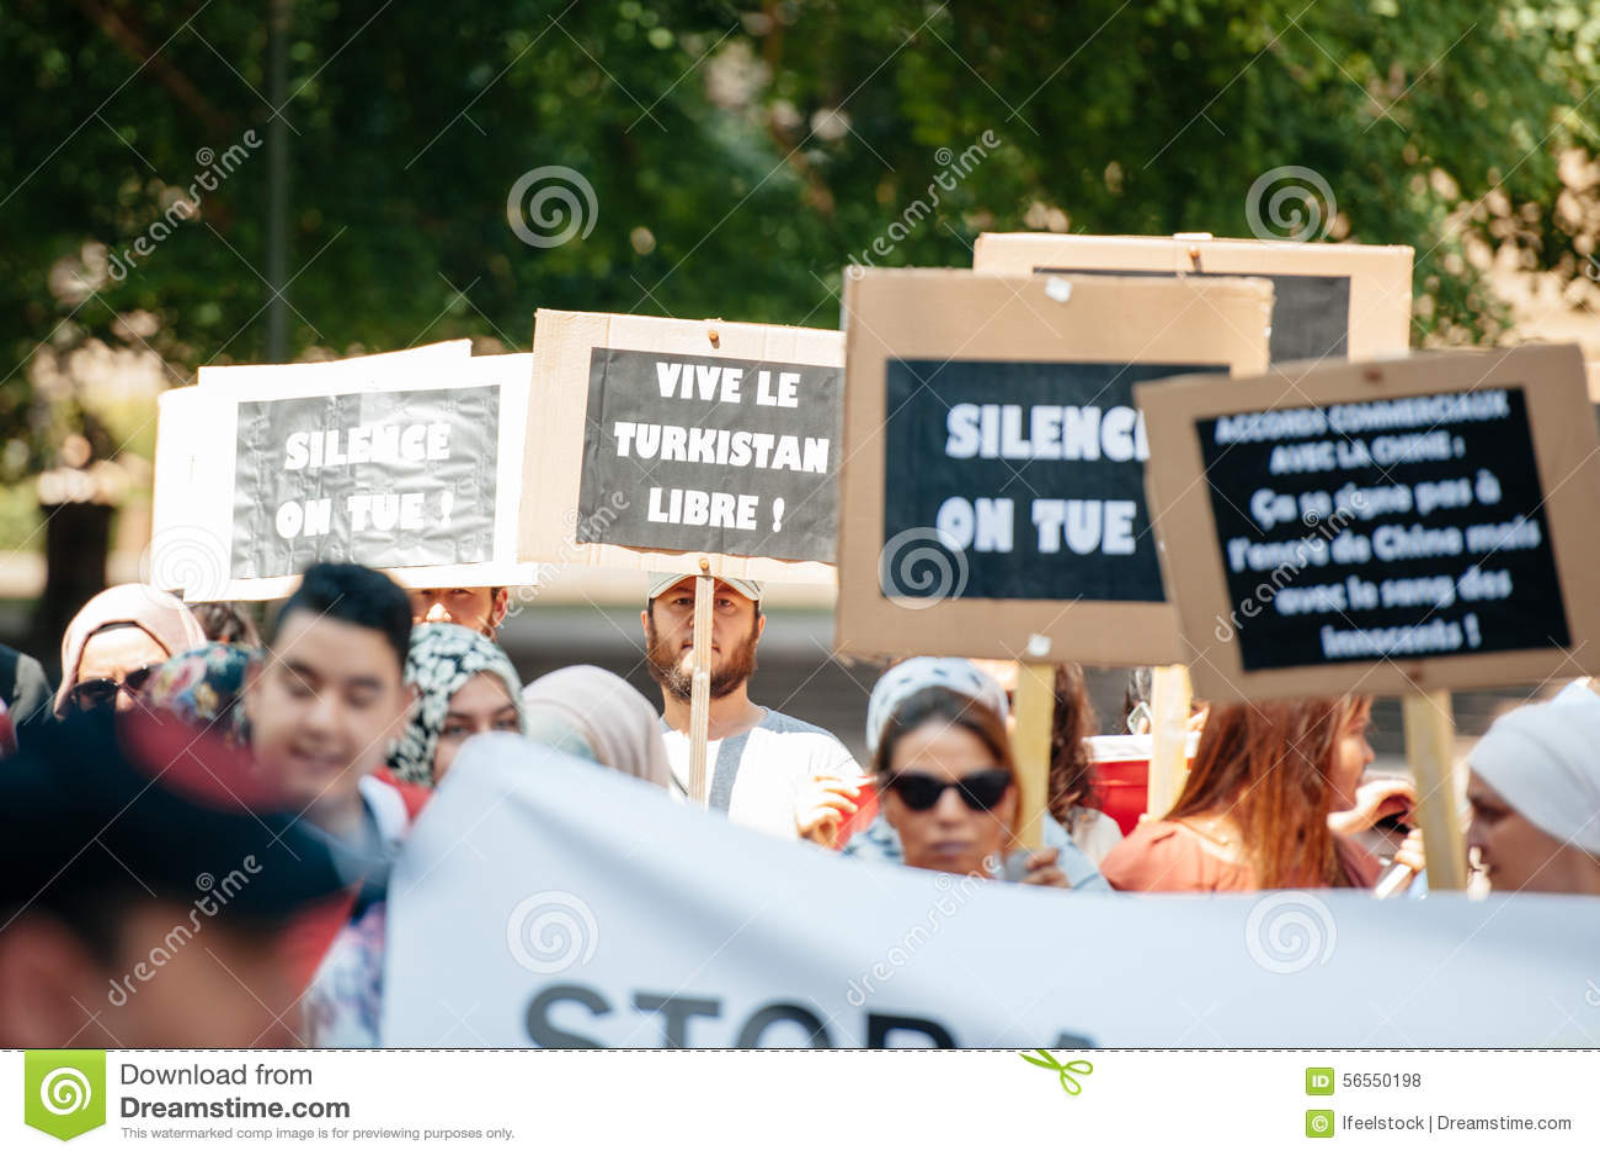 Download Διαμαρτυρία ενεργών στελεχών των ανθρώπινων δικαιωμάτων Uyghur Εκδοτική Στοκ Εικόνες - εικόνα από γεγονός, διαμαρτυρία: 56550198